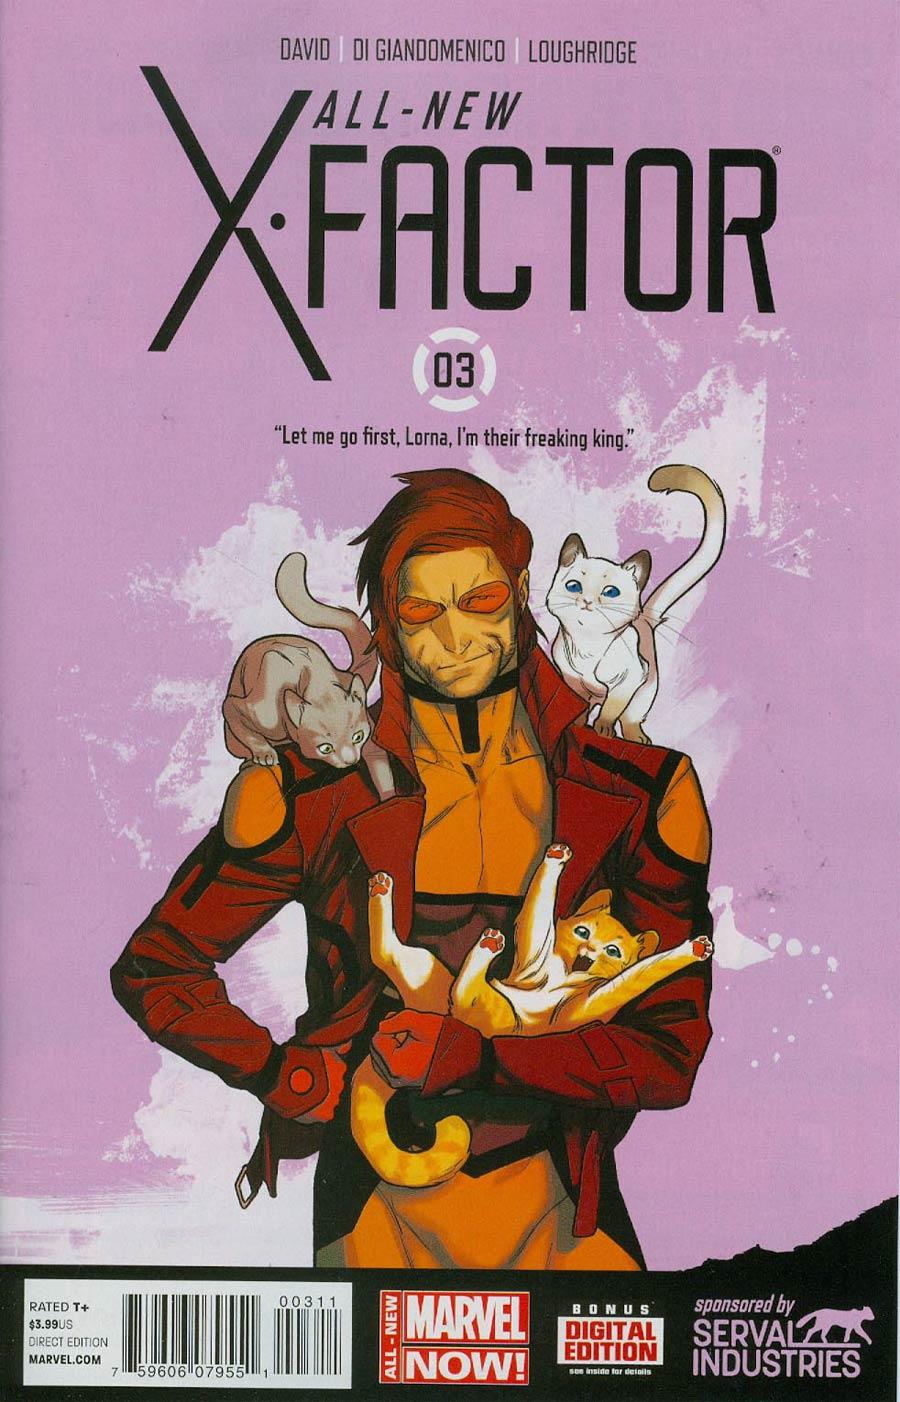 All-New X-Factor #3 Cover A Regular Kris Anka Cover